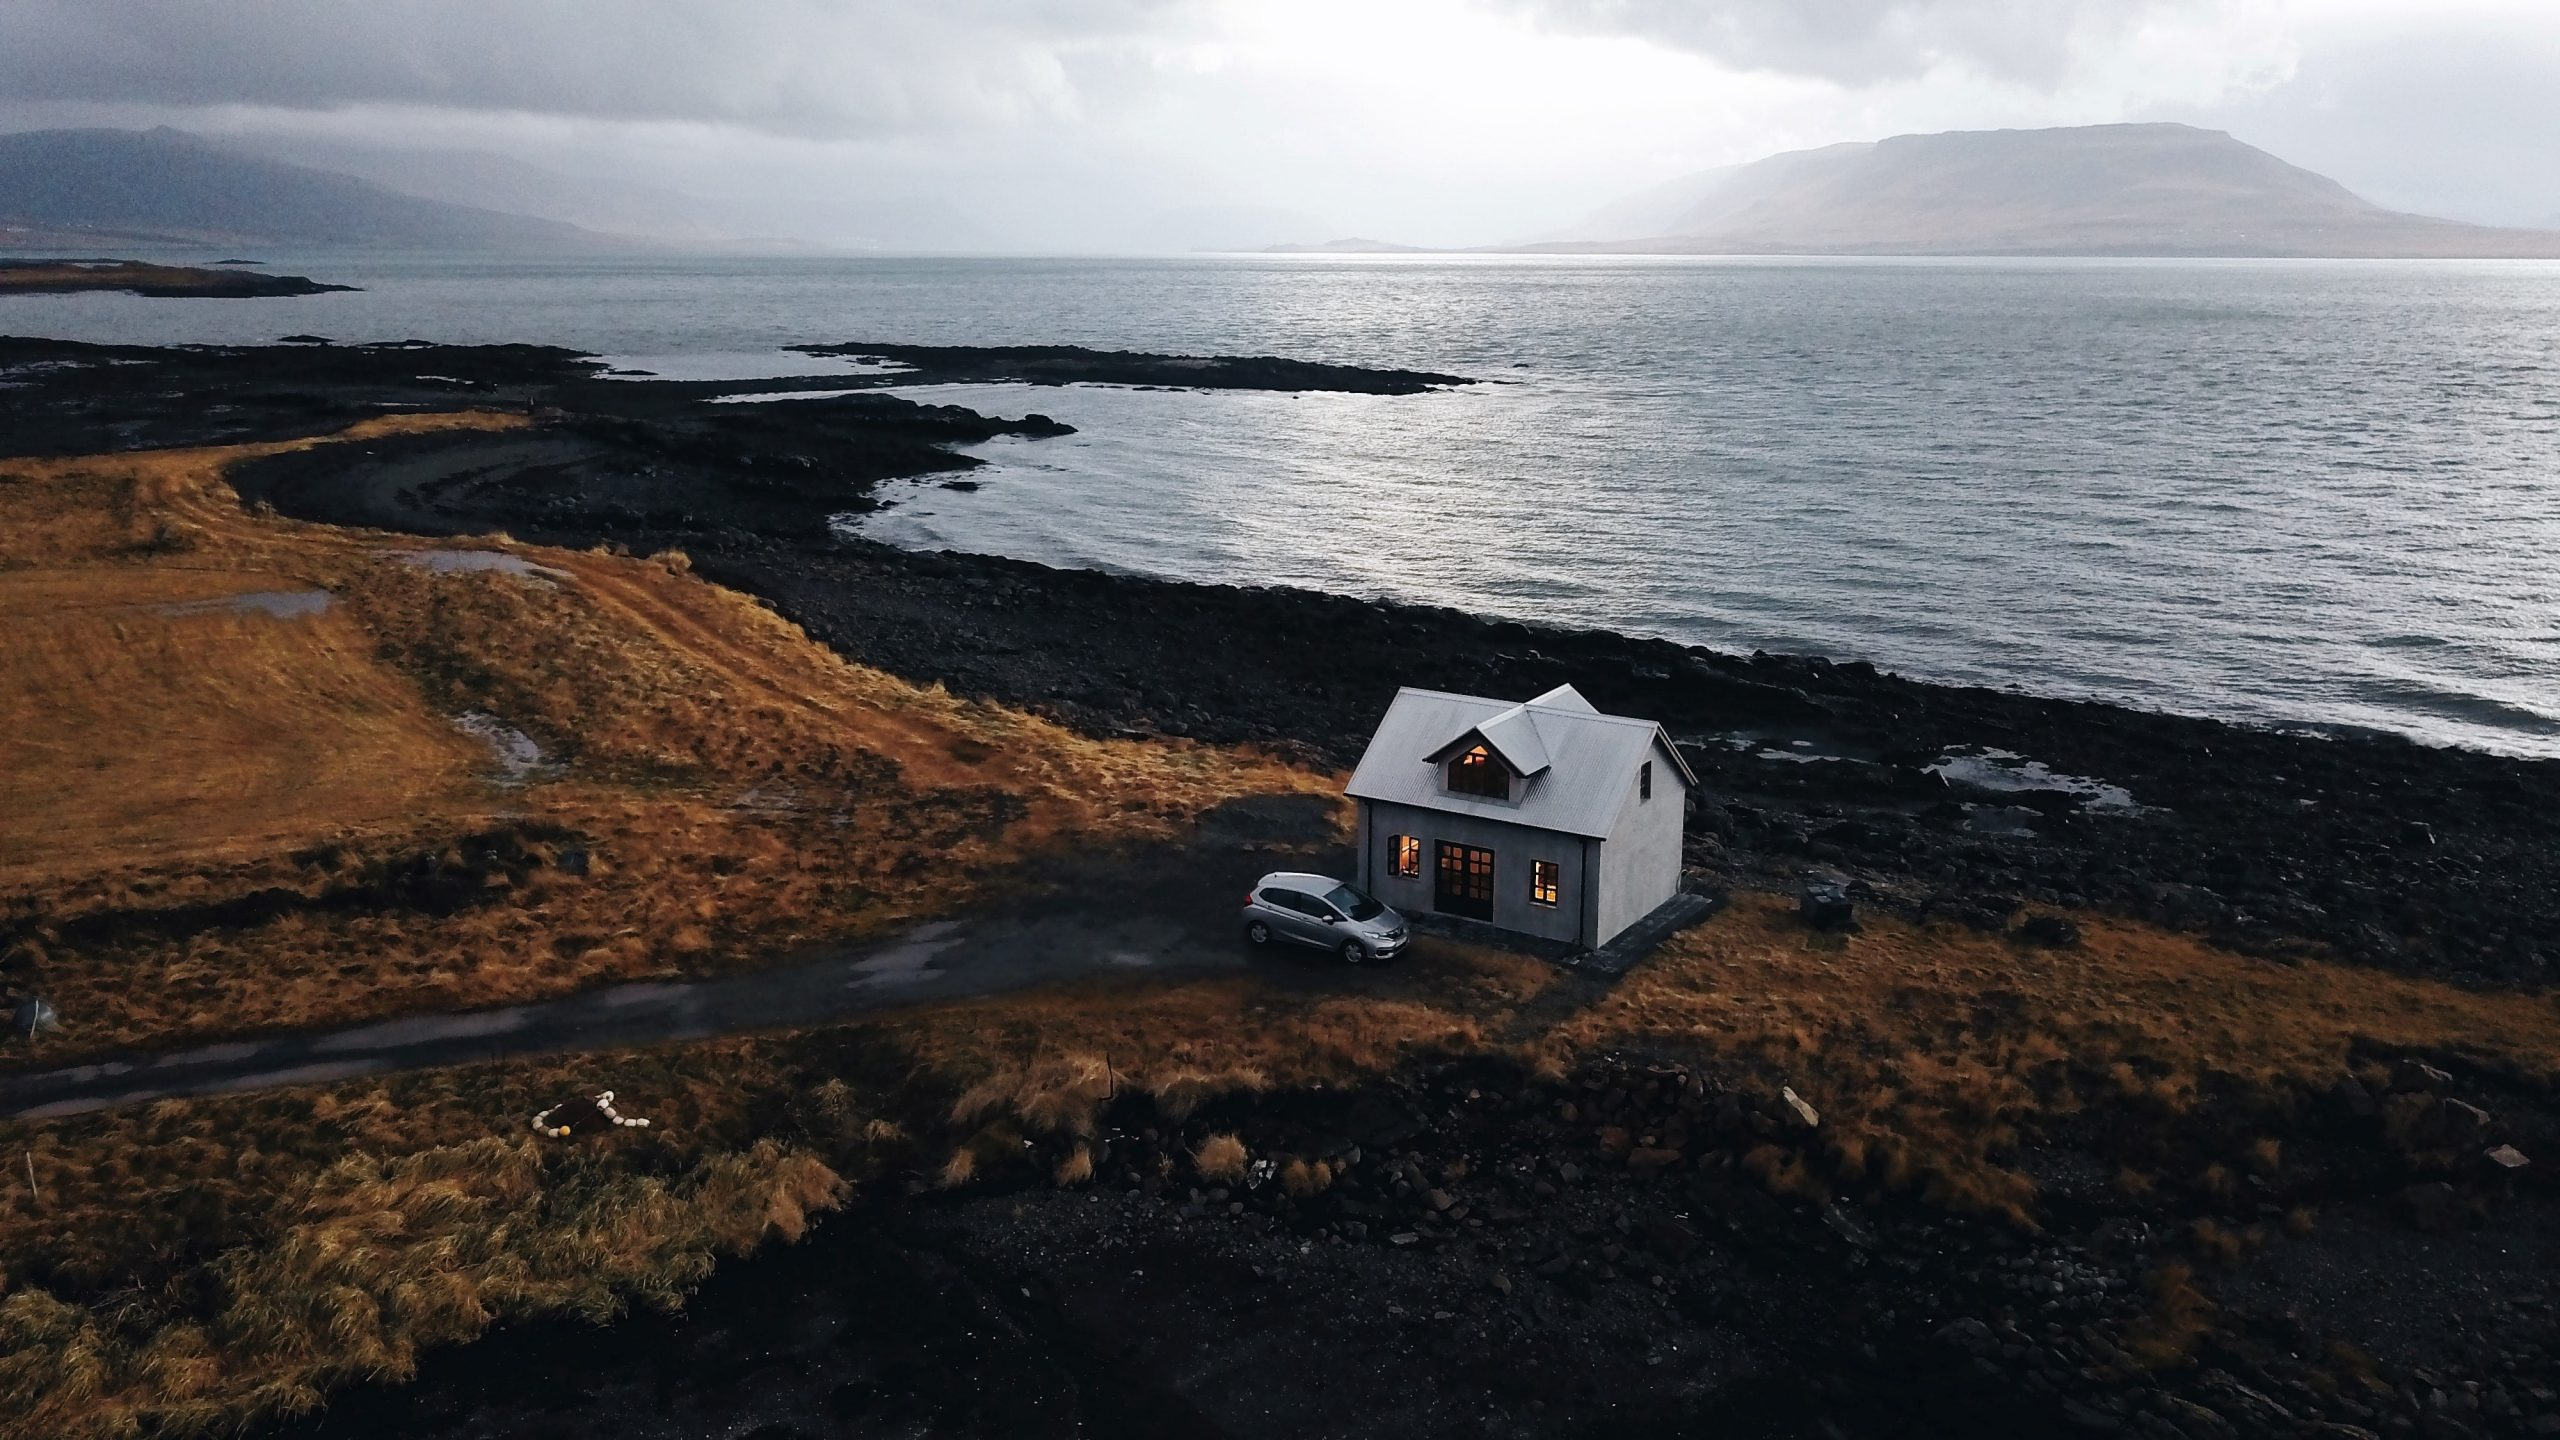 Solitary House at the Seashore